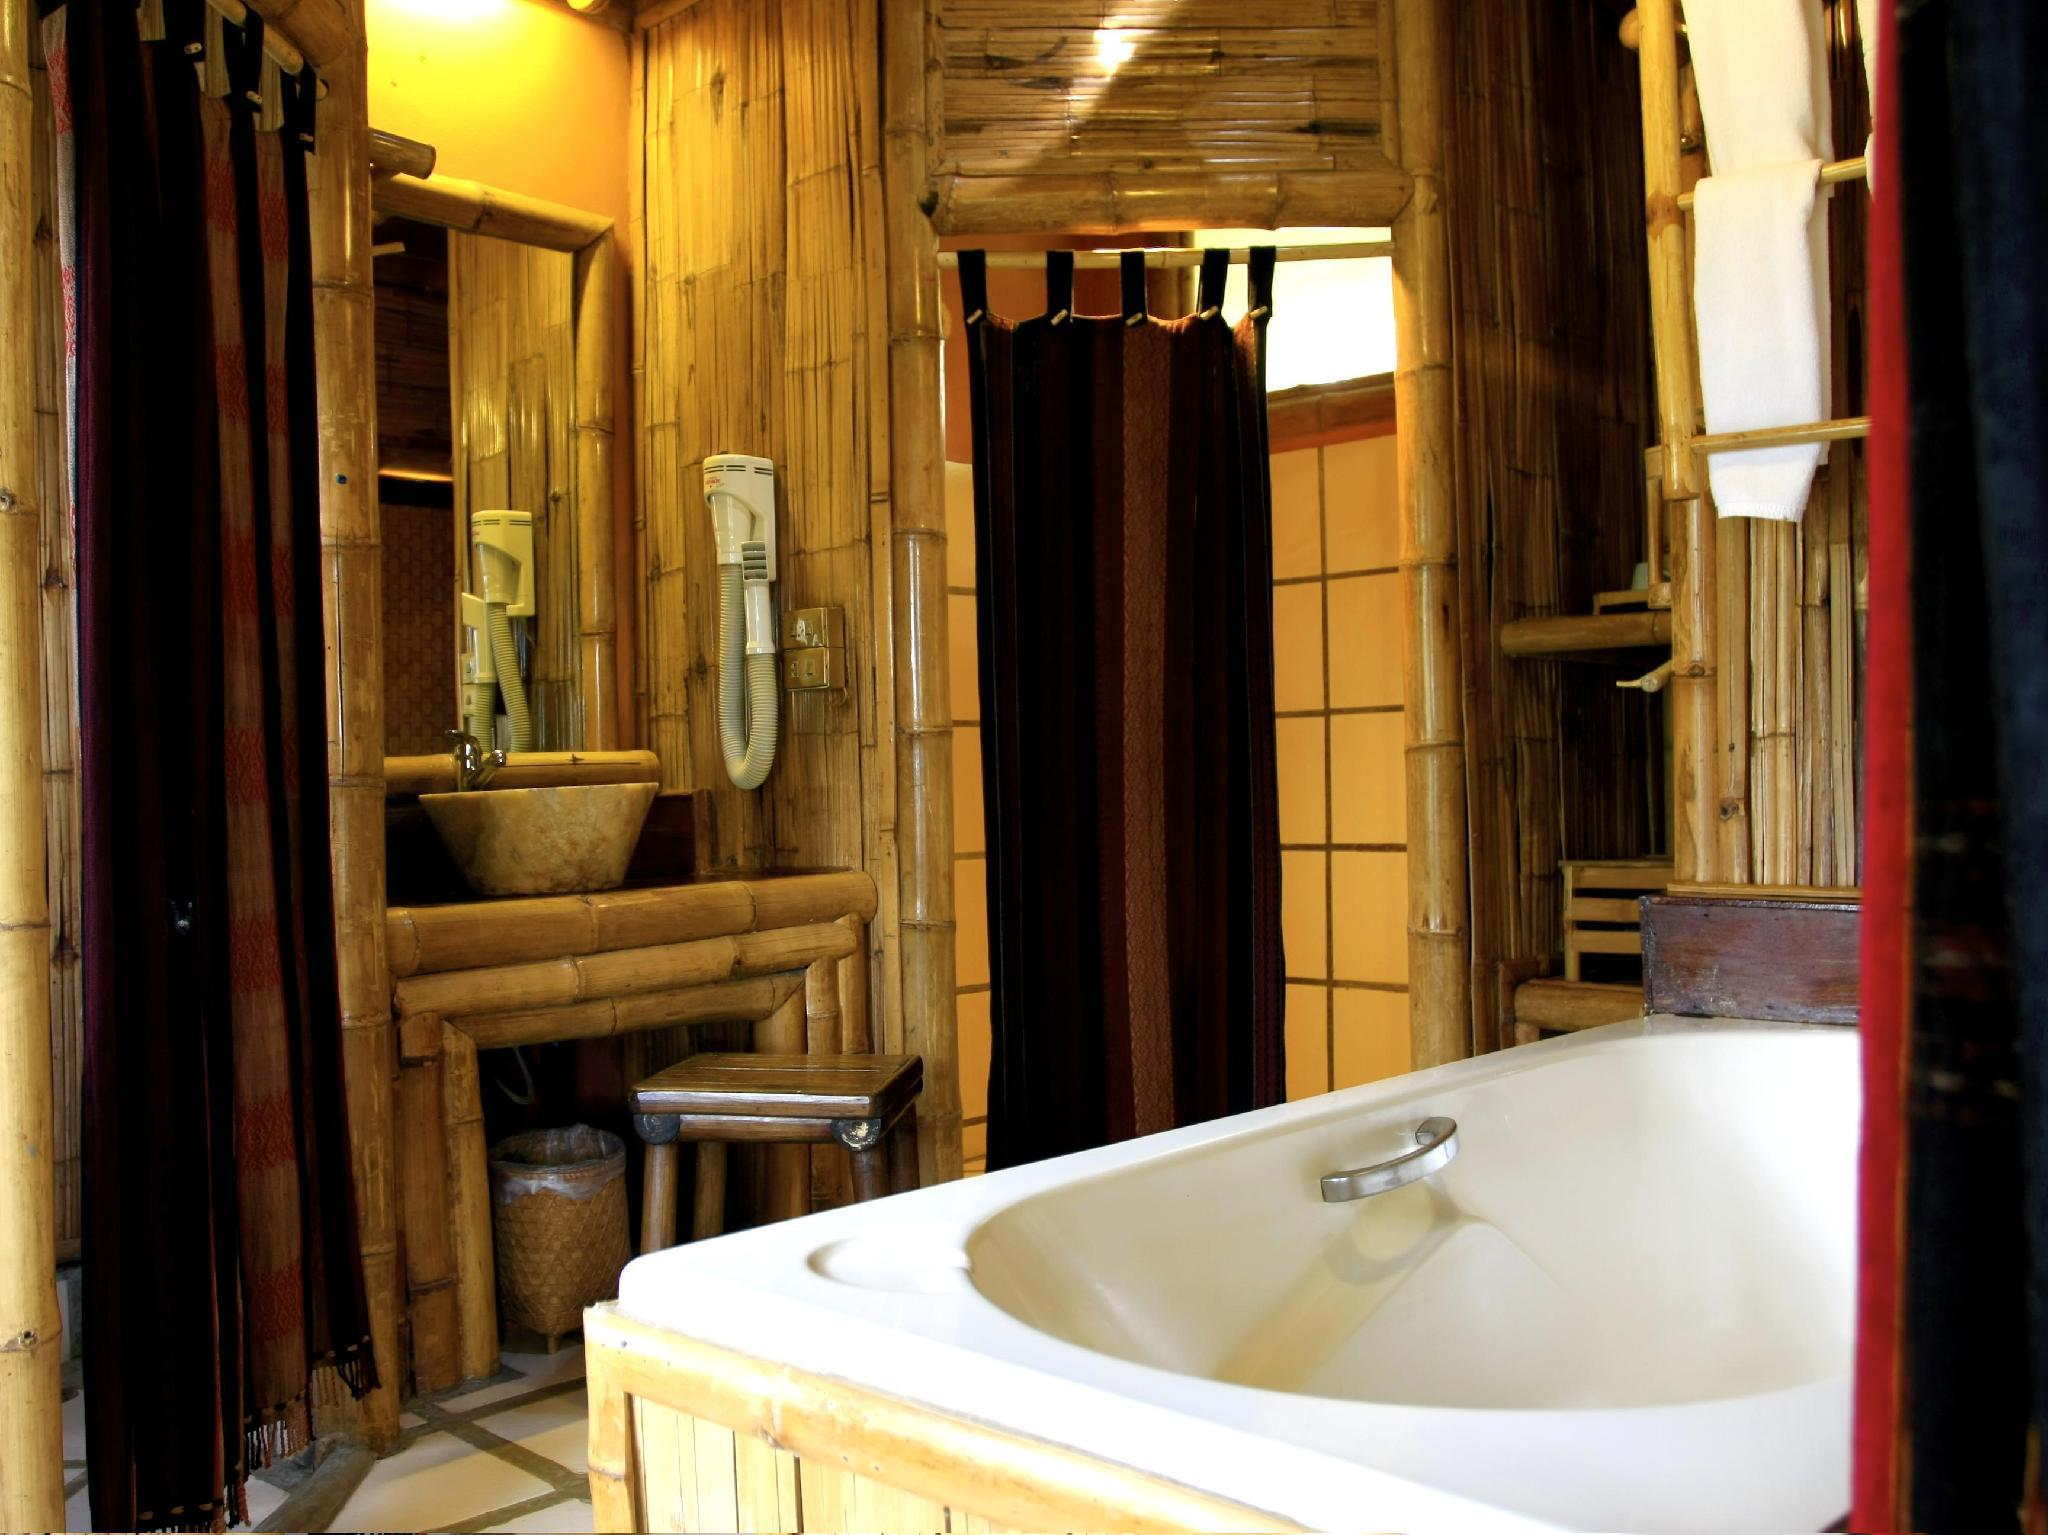 Phu Chaisai Mountain Resort ภูใจใส เมาน์เท่น รีสอร์ต